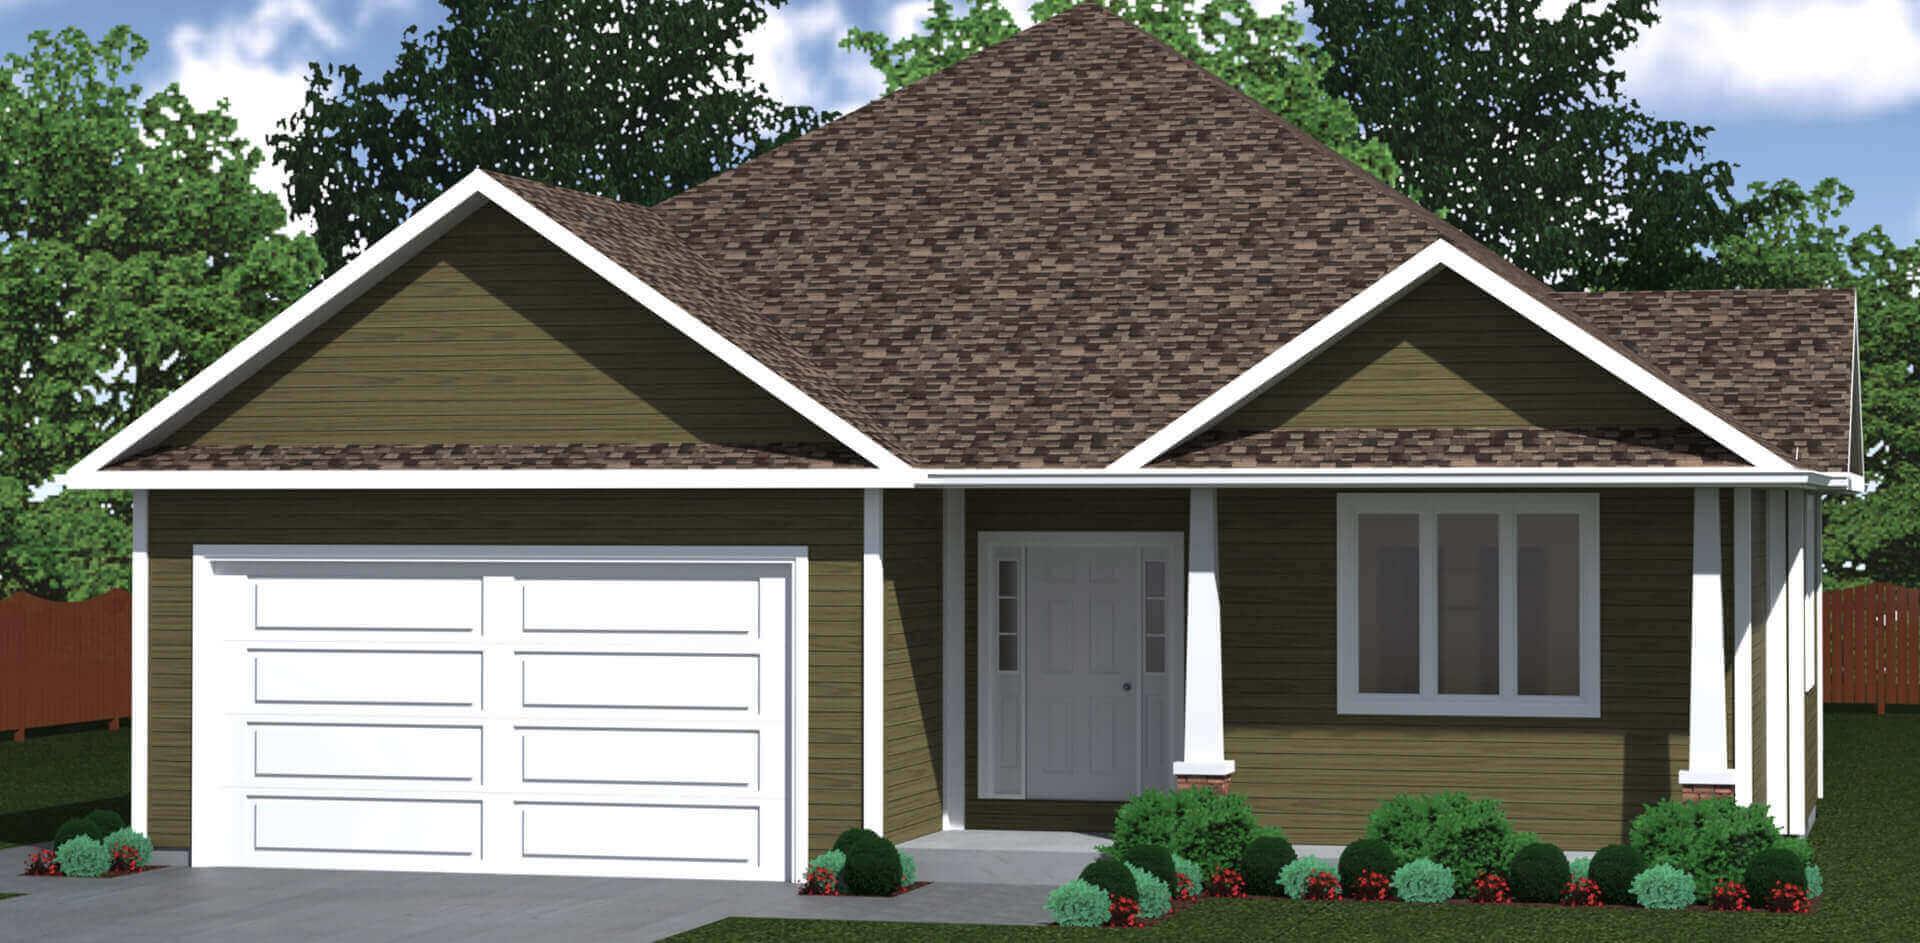 1620b house elevation